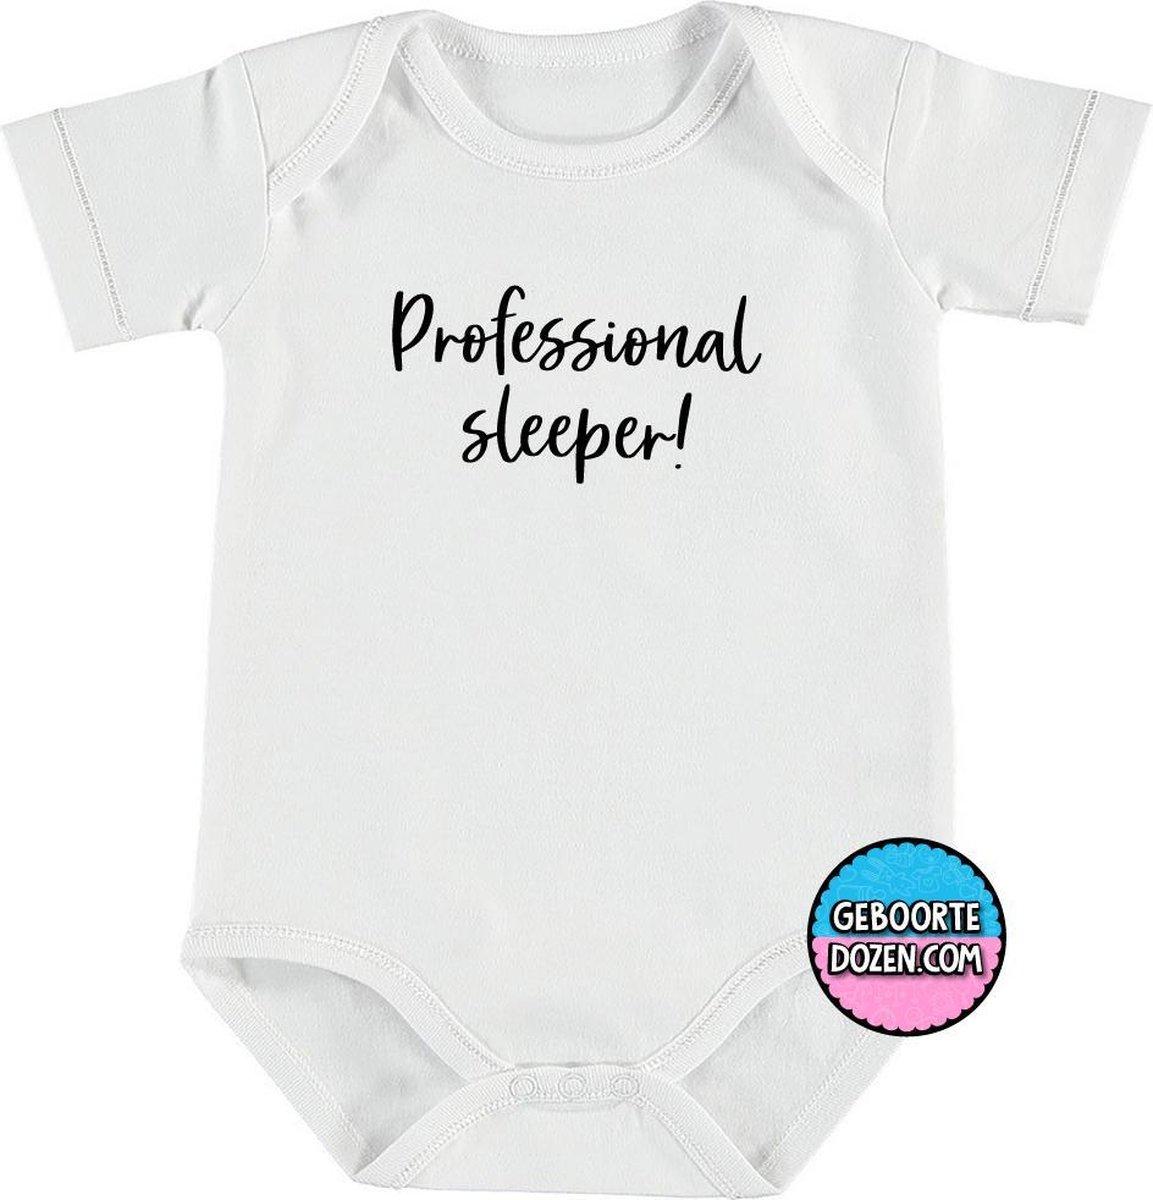 Romper - baby - rompertjes baby - rompertjes baby met tekst | Korte mouwen | Wit | Professionel sleeper! | maat 50/56